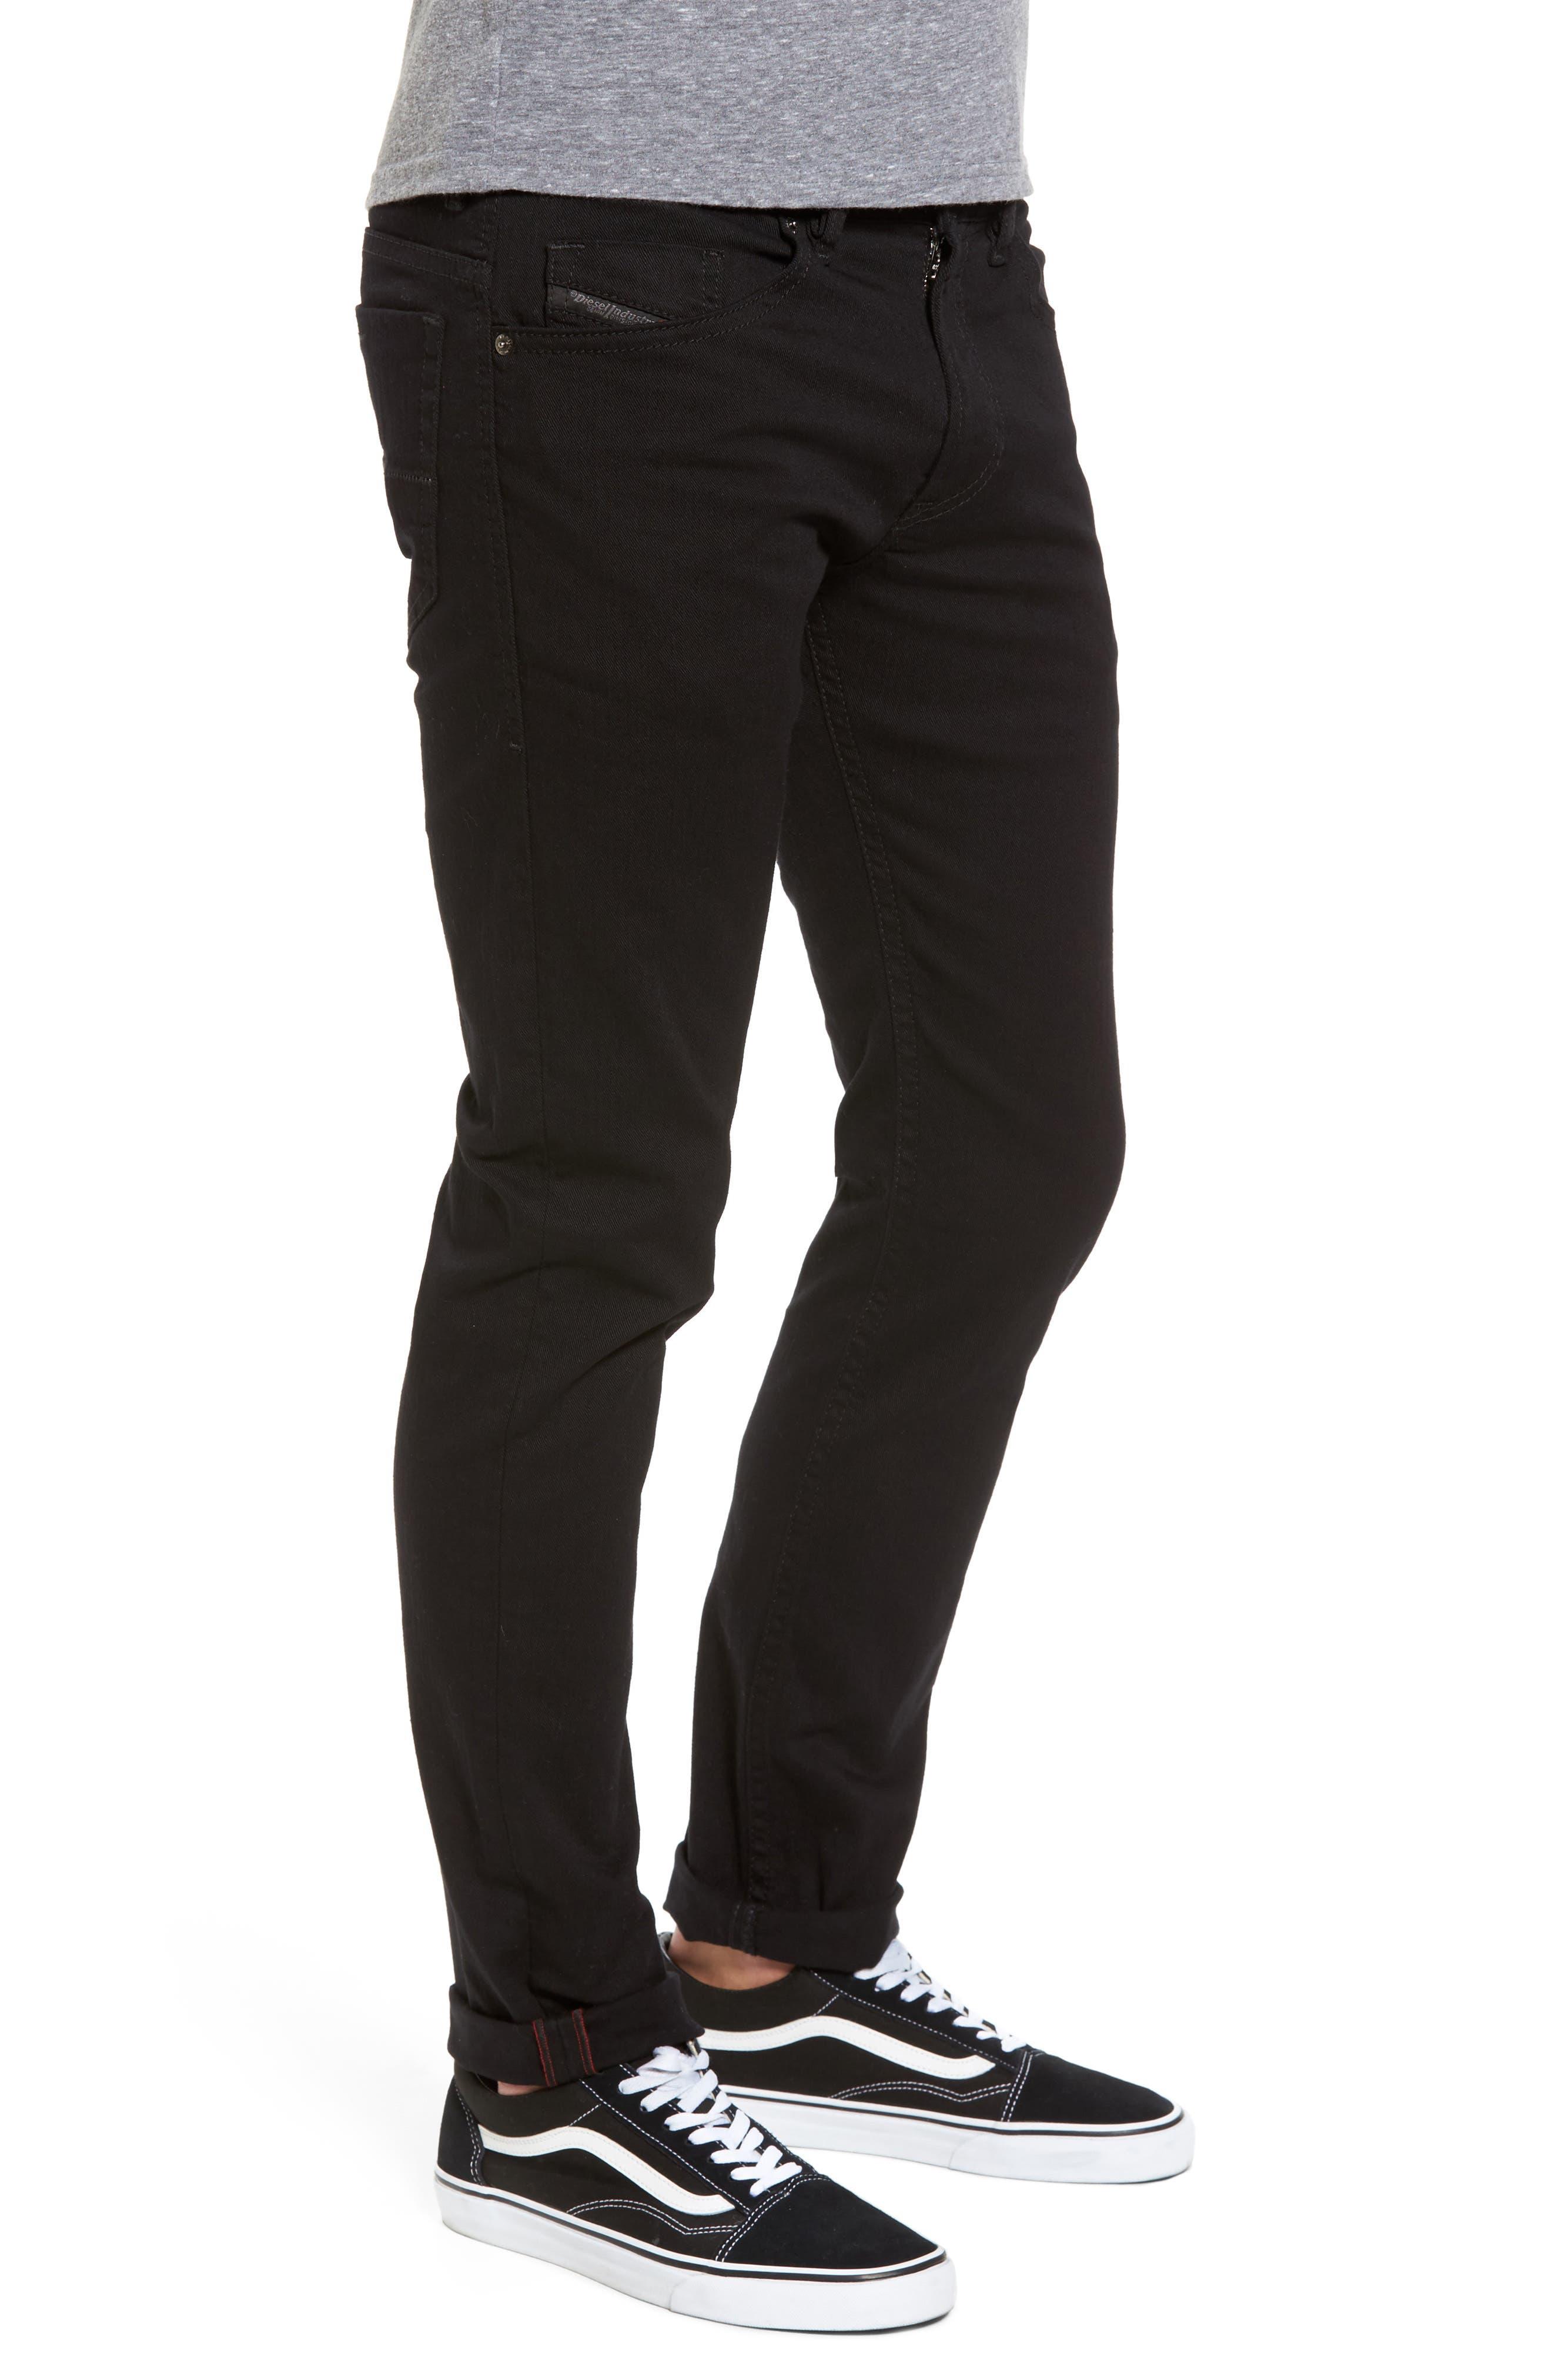 DIESEL<SUP>®</SUP>, Thommer Slim Fit Jeans, Alternate thumbnail 4, color, BLACK/ DENIM